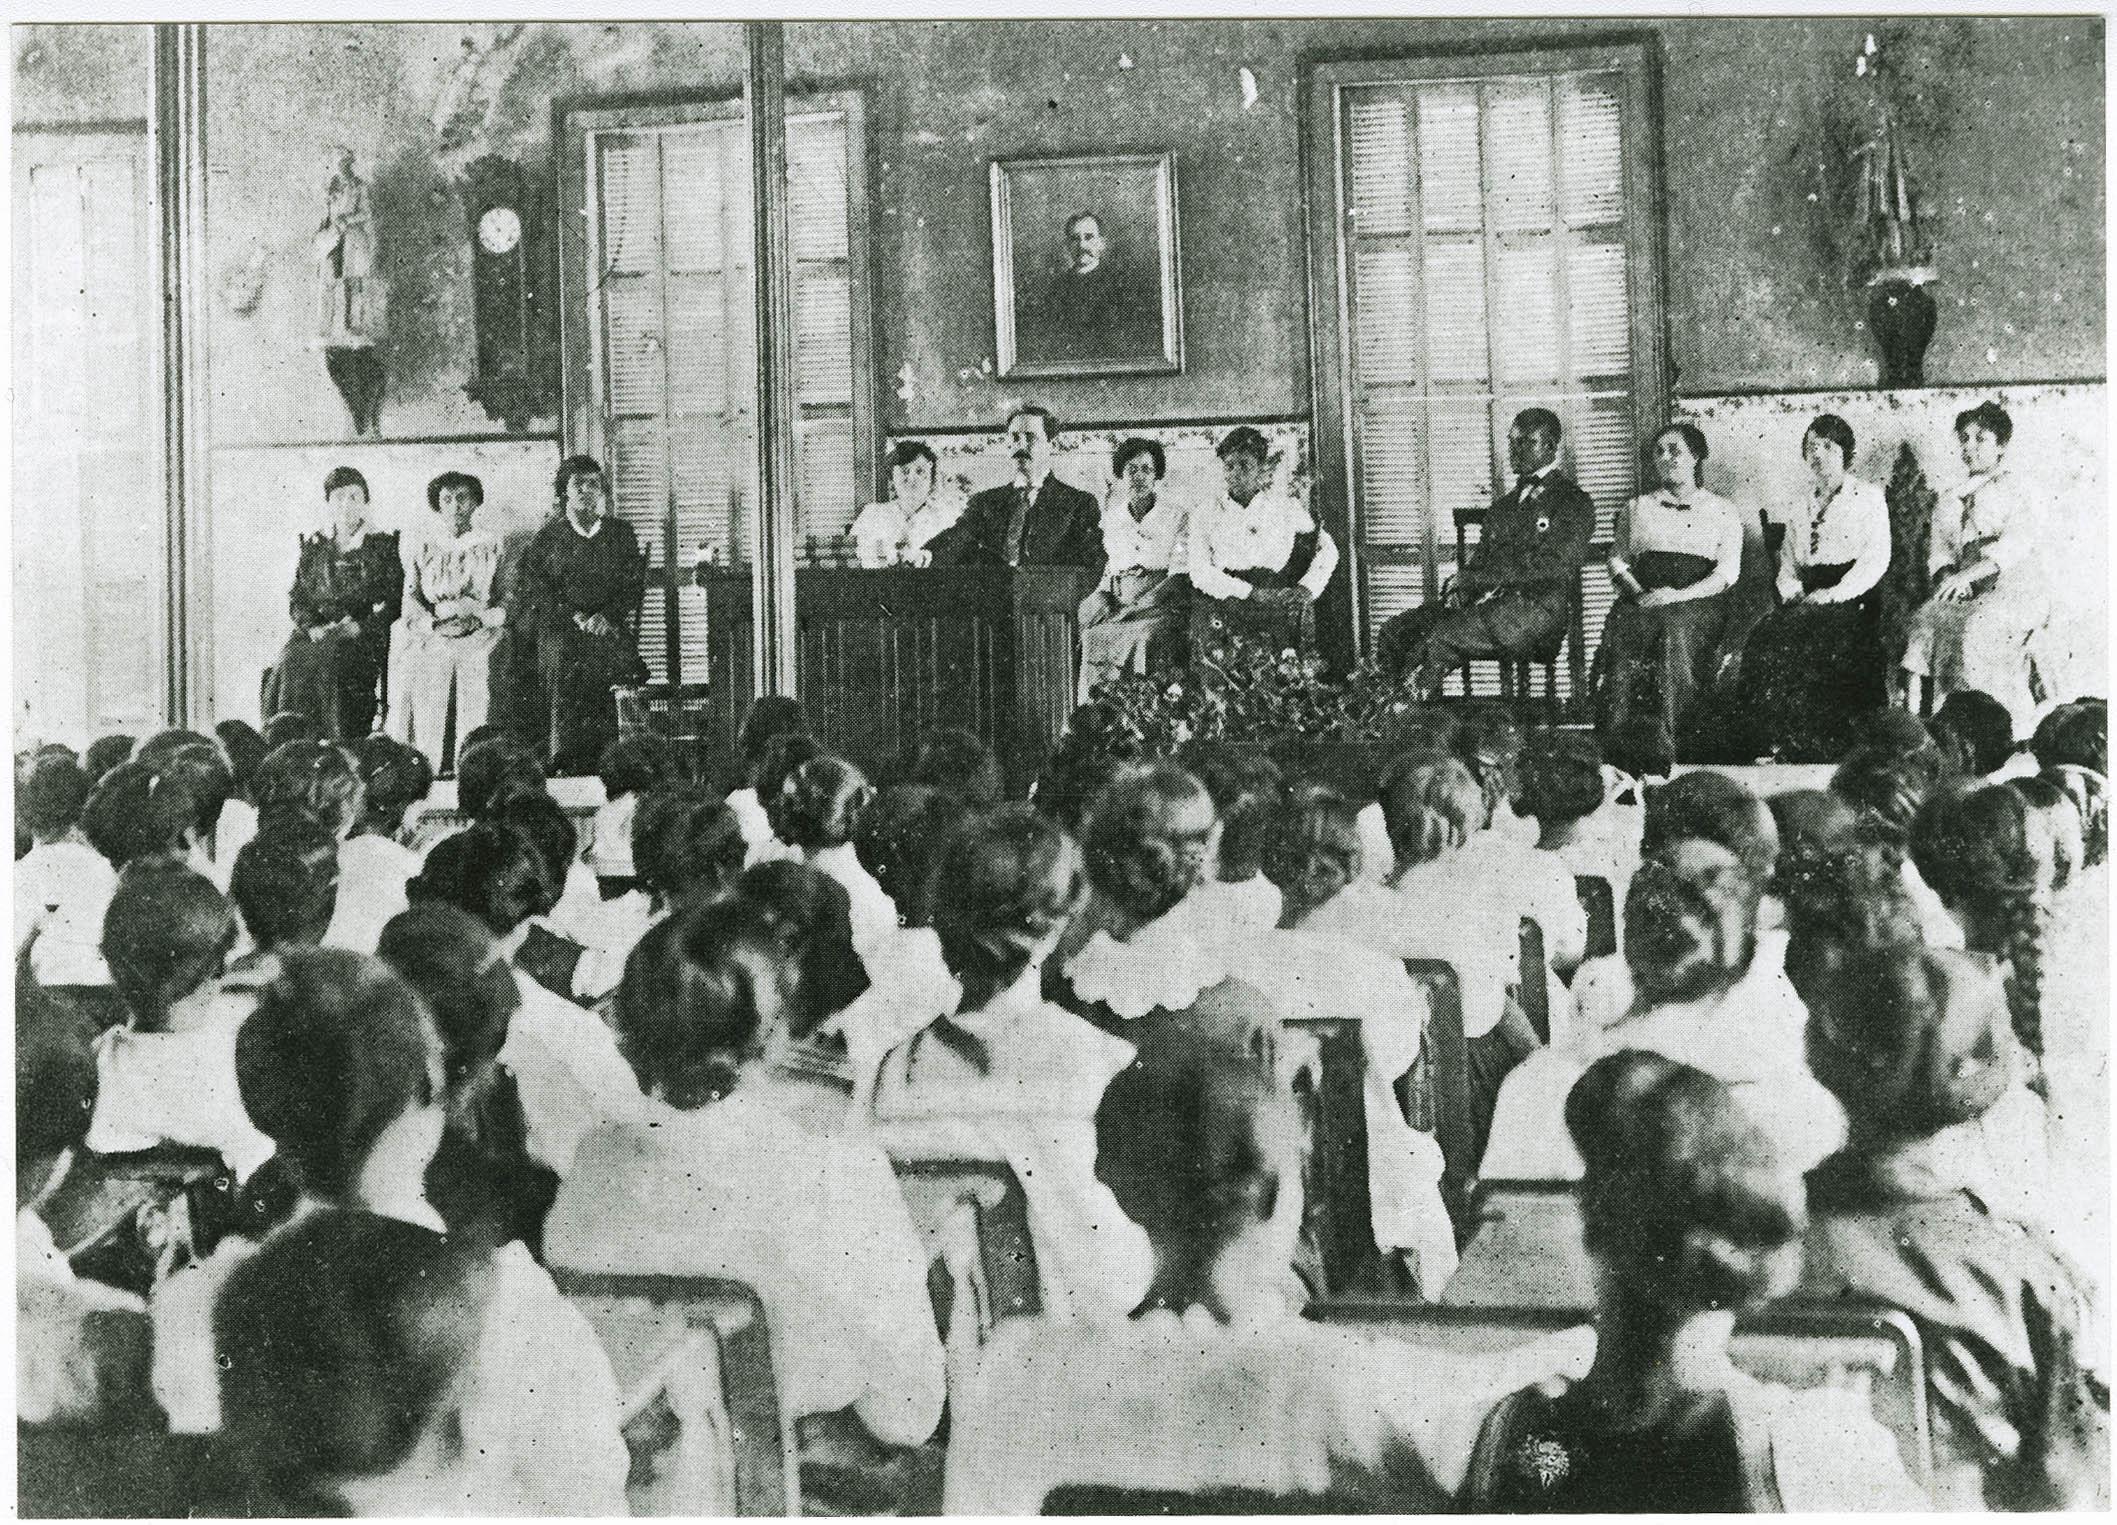 Principal Cox addressing studentbody in Avery auditorium